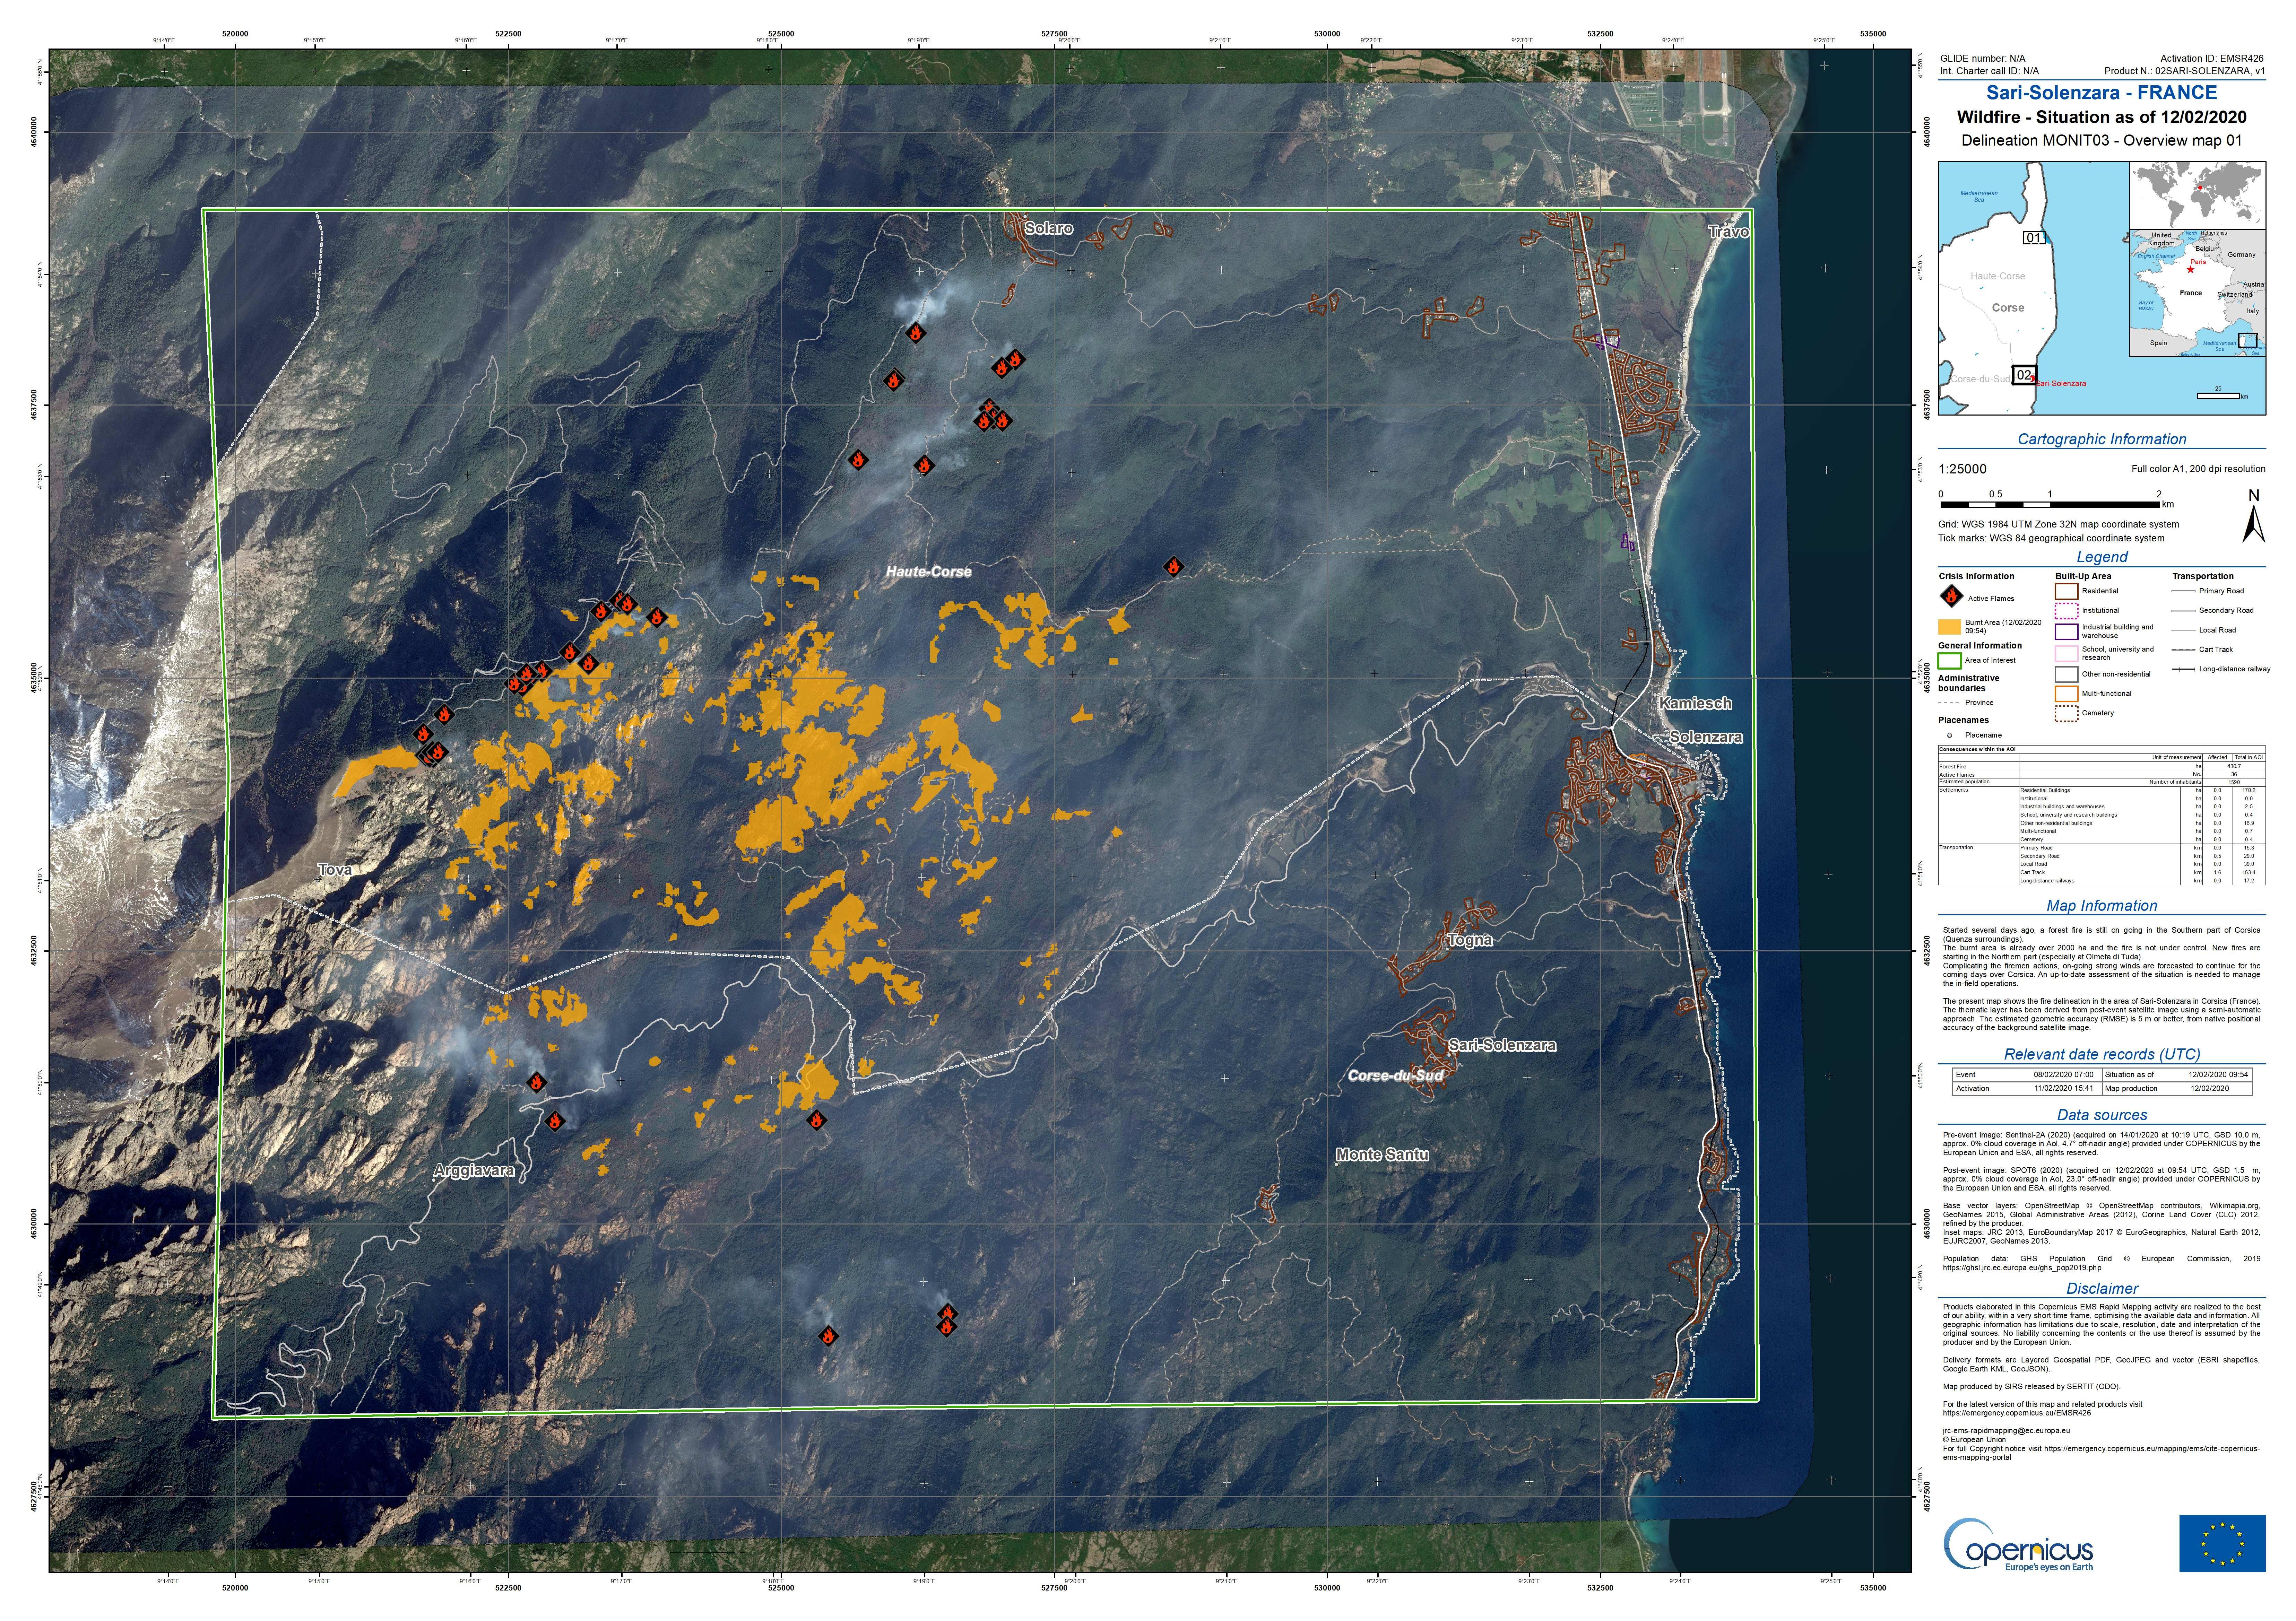 Tempête Ciara - Corse - Incendie - Emergency Mapping Service - Sari-Solenzara - Copernicus - satellite - fire - feux - SPOT6 - Airbus Defence and Space